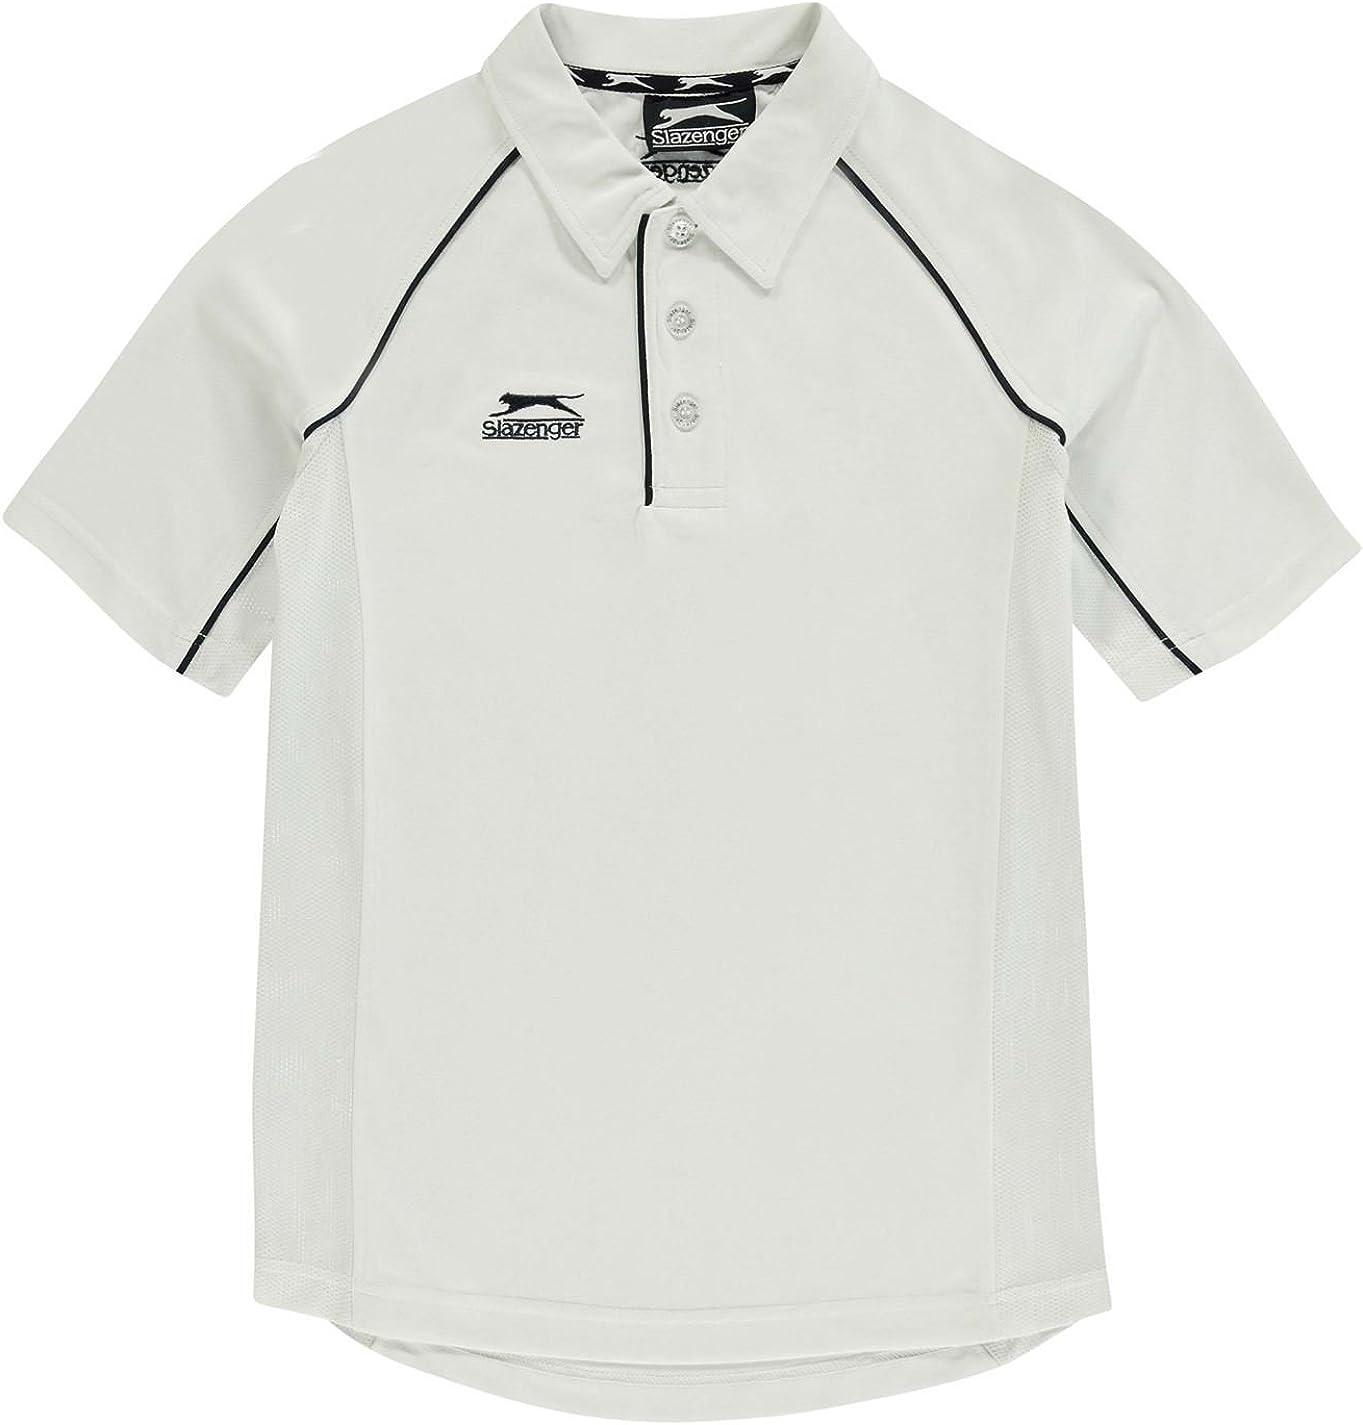 Slazenger Cricket Shirt Age 7-8